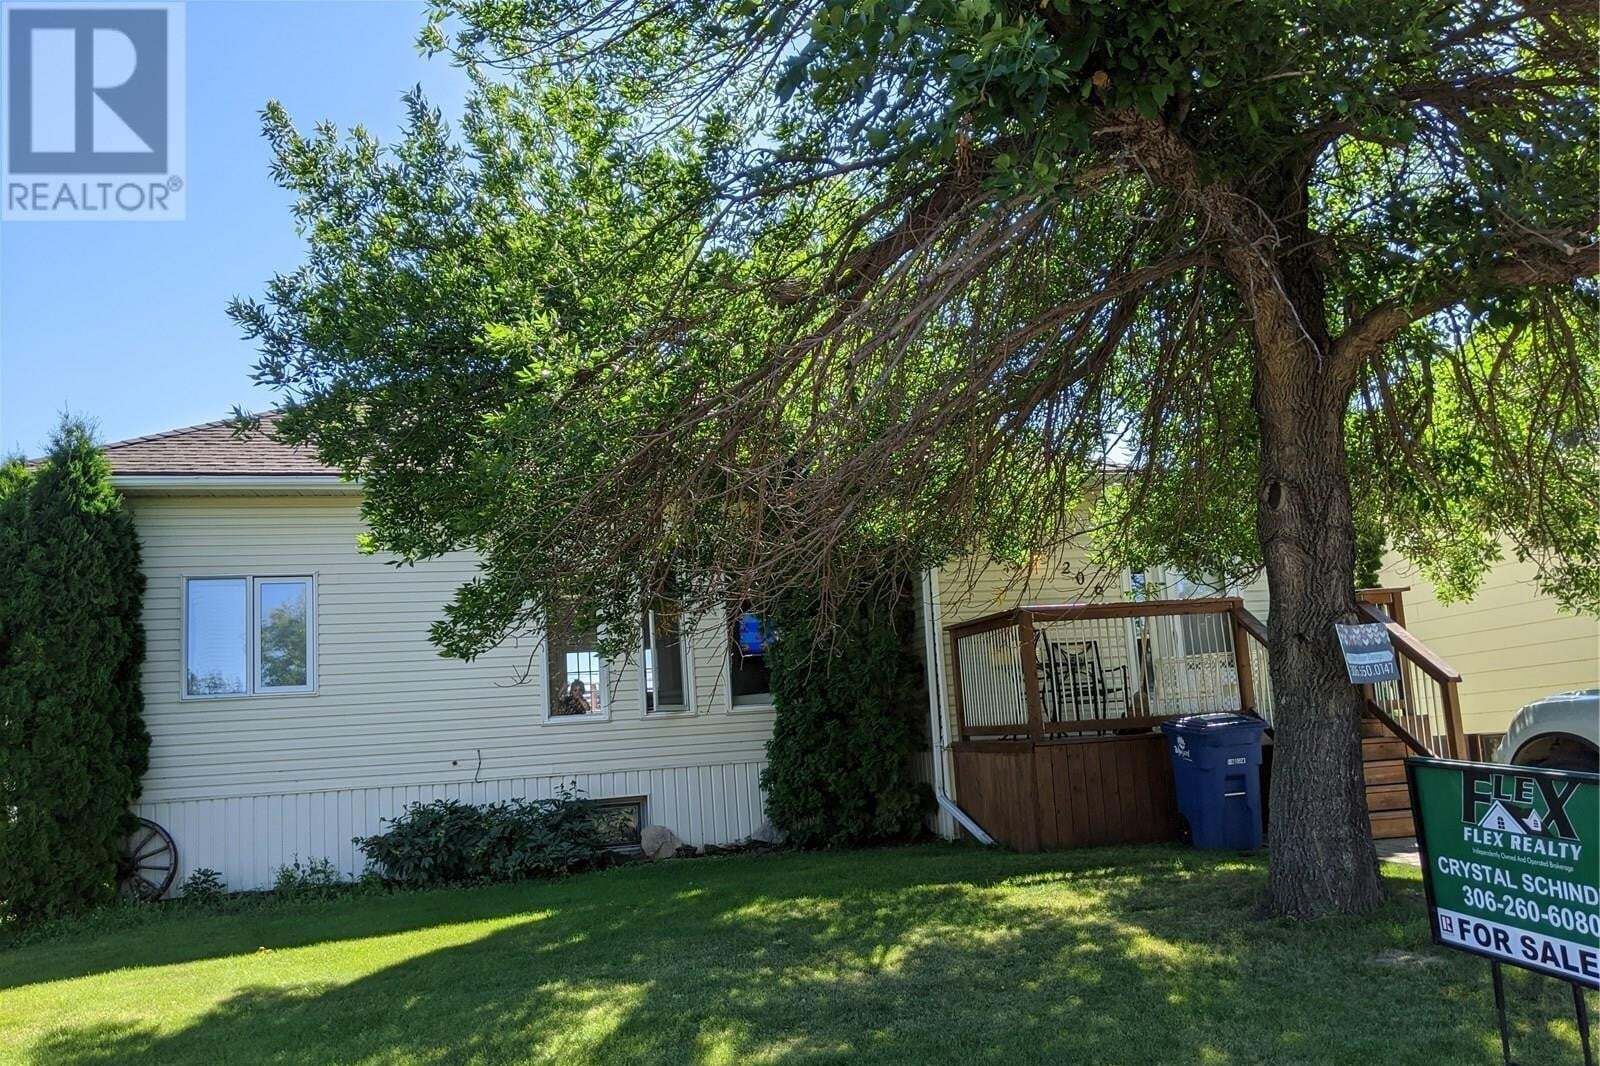 House for sale at 206 6th St E Wynyard Saskatchewan - MLS: SK819800